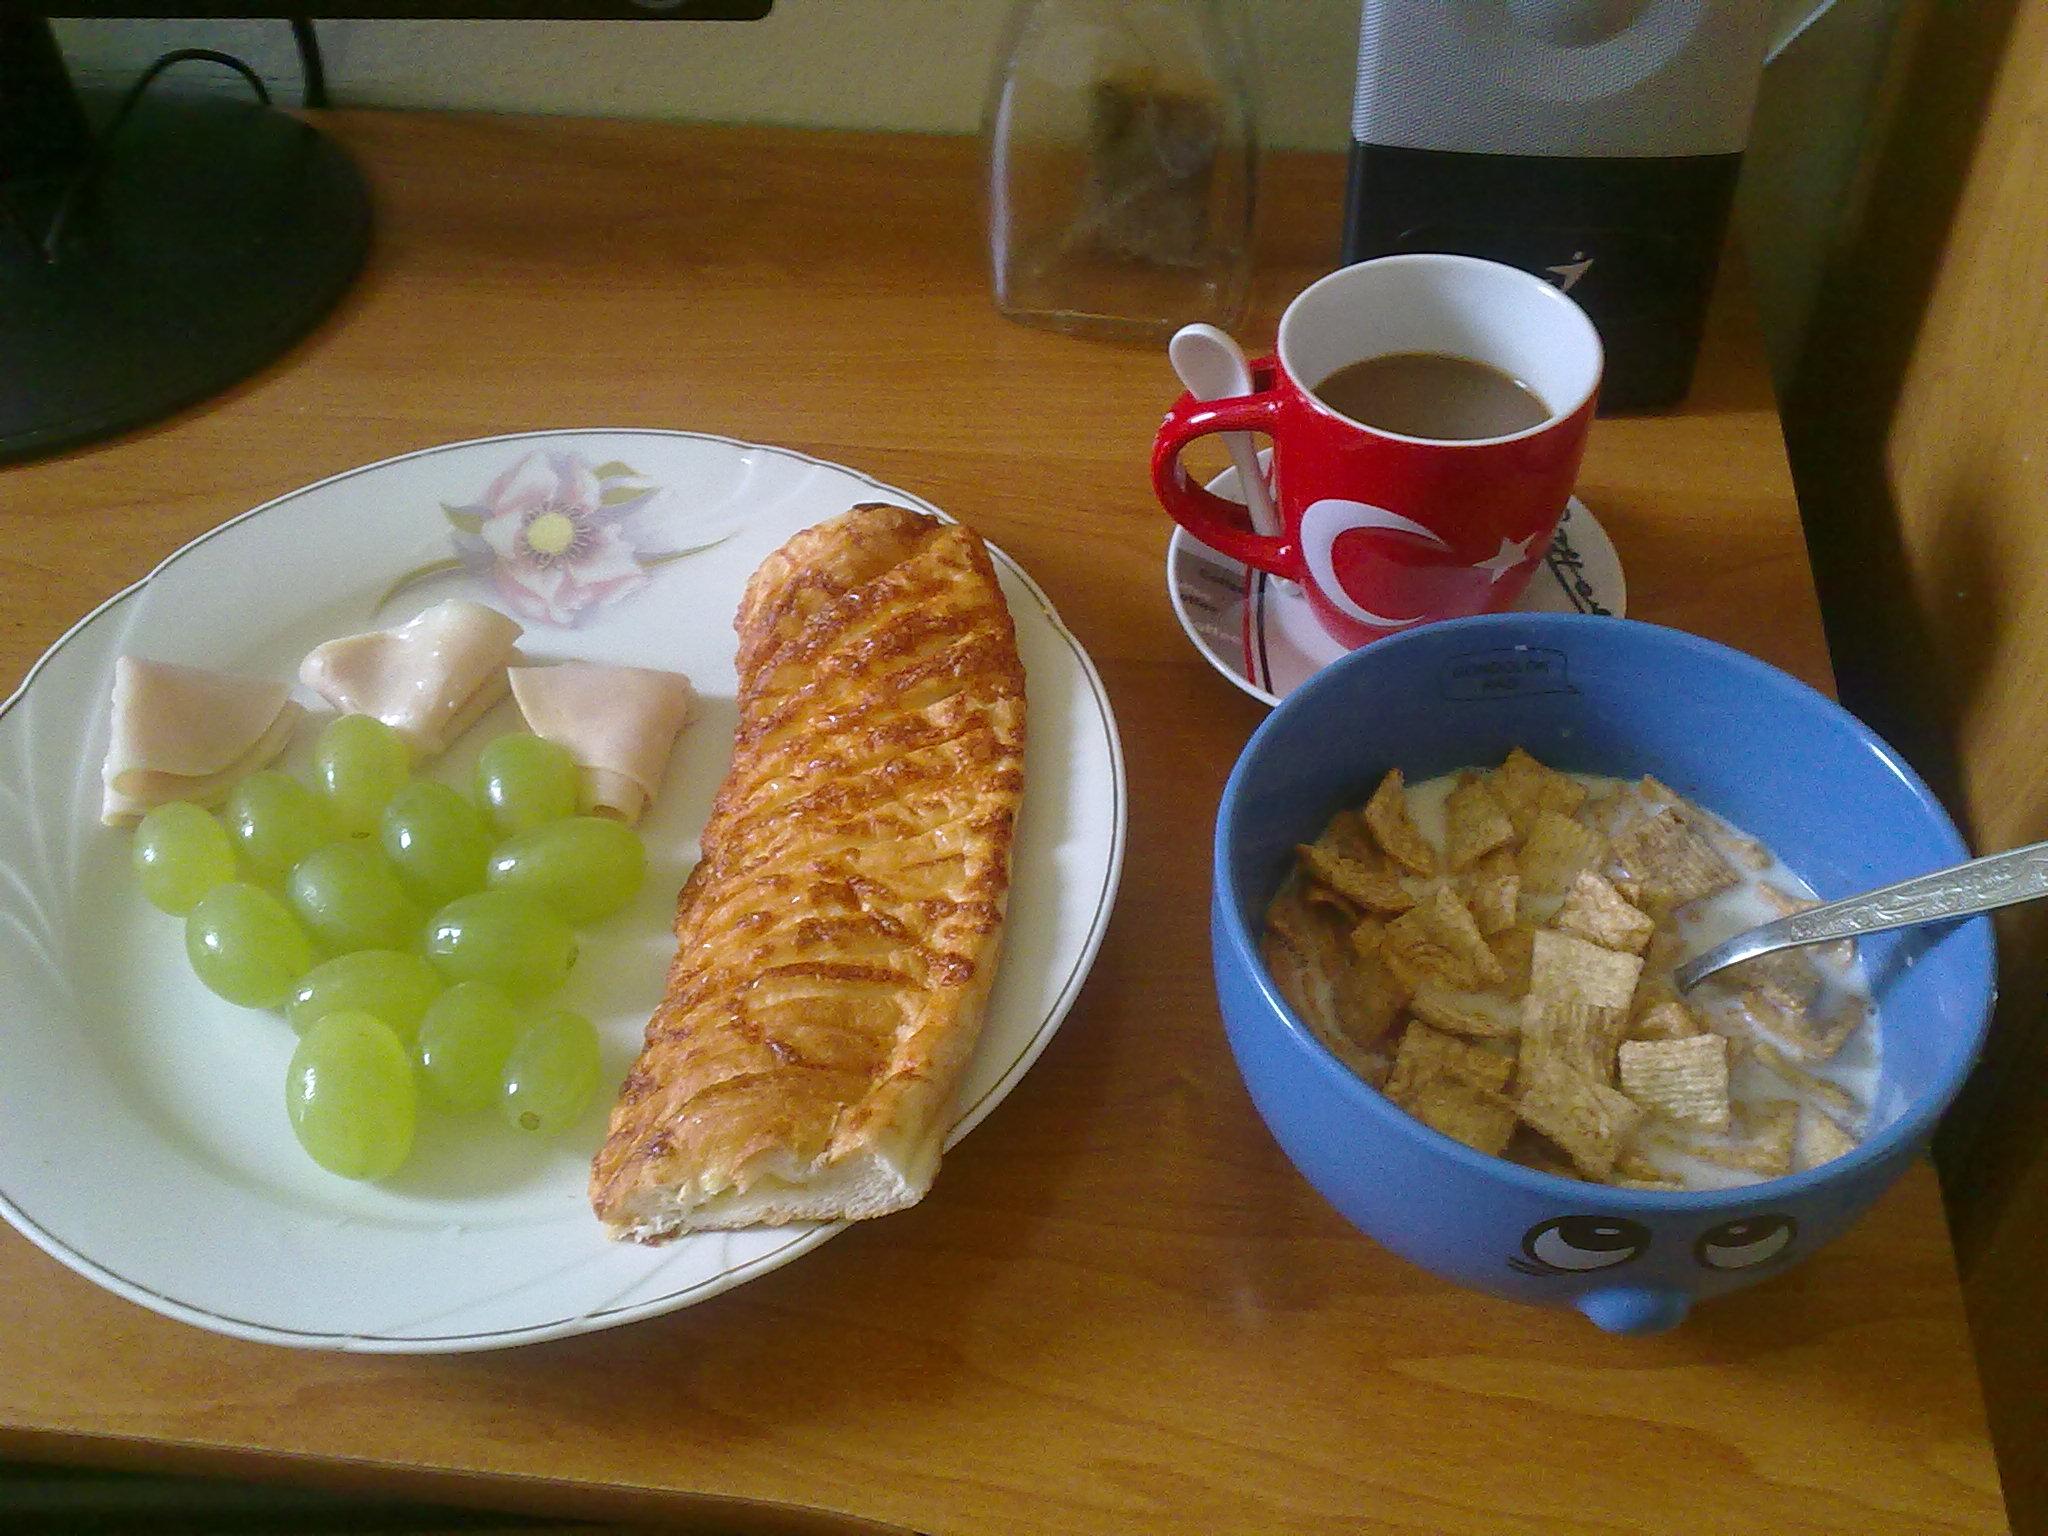 https://foodloader.net/glKz_2010-08-23_breakfastwithcoffee-cheessbag-grapes-ciniminis.jpg